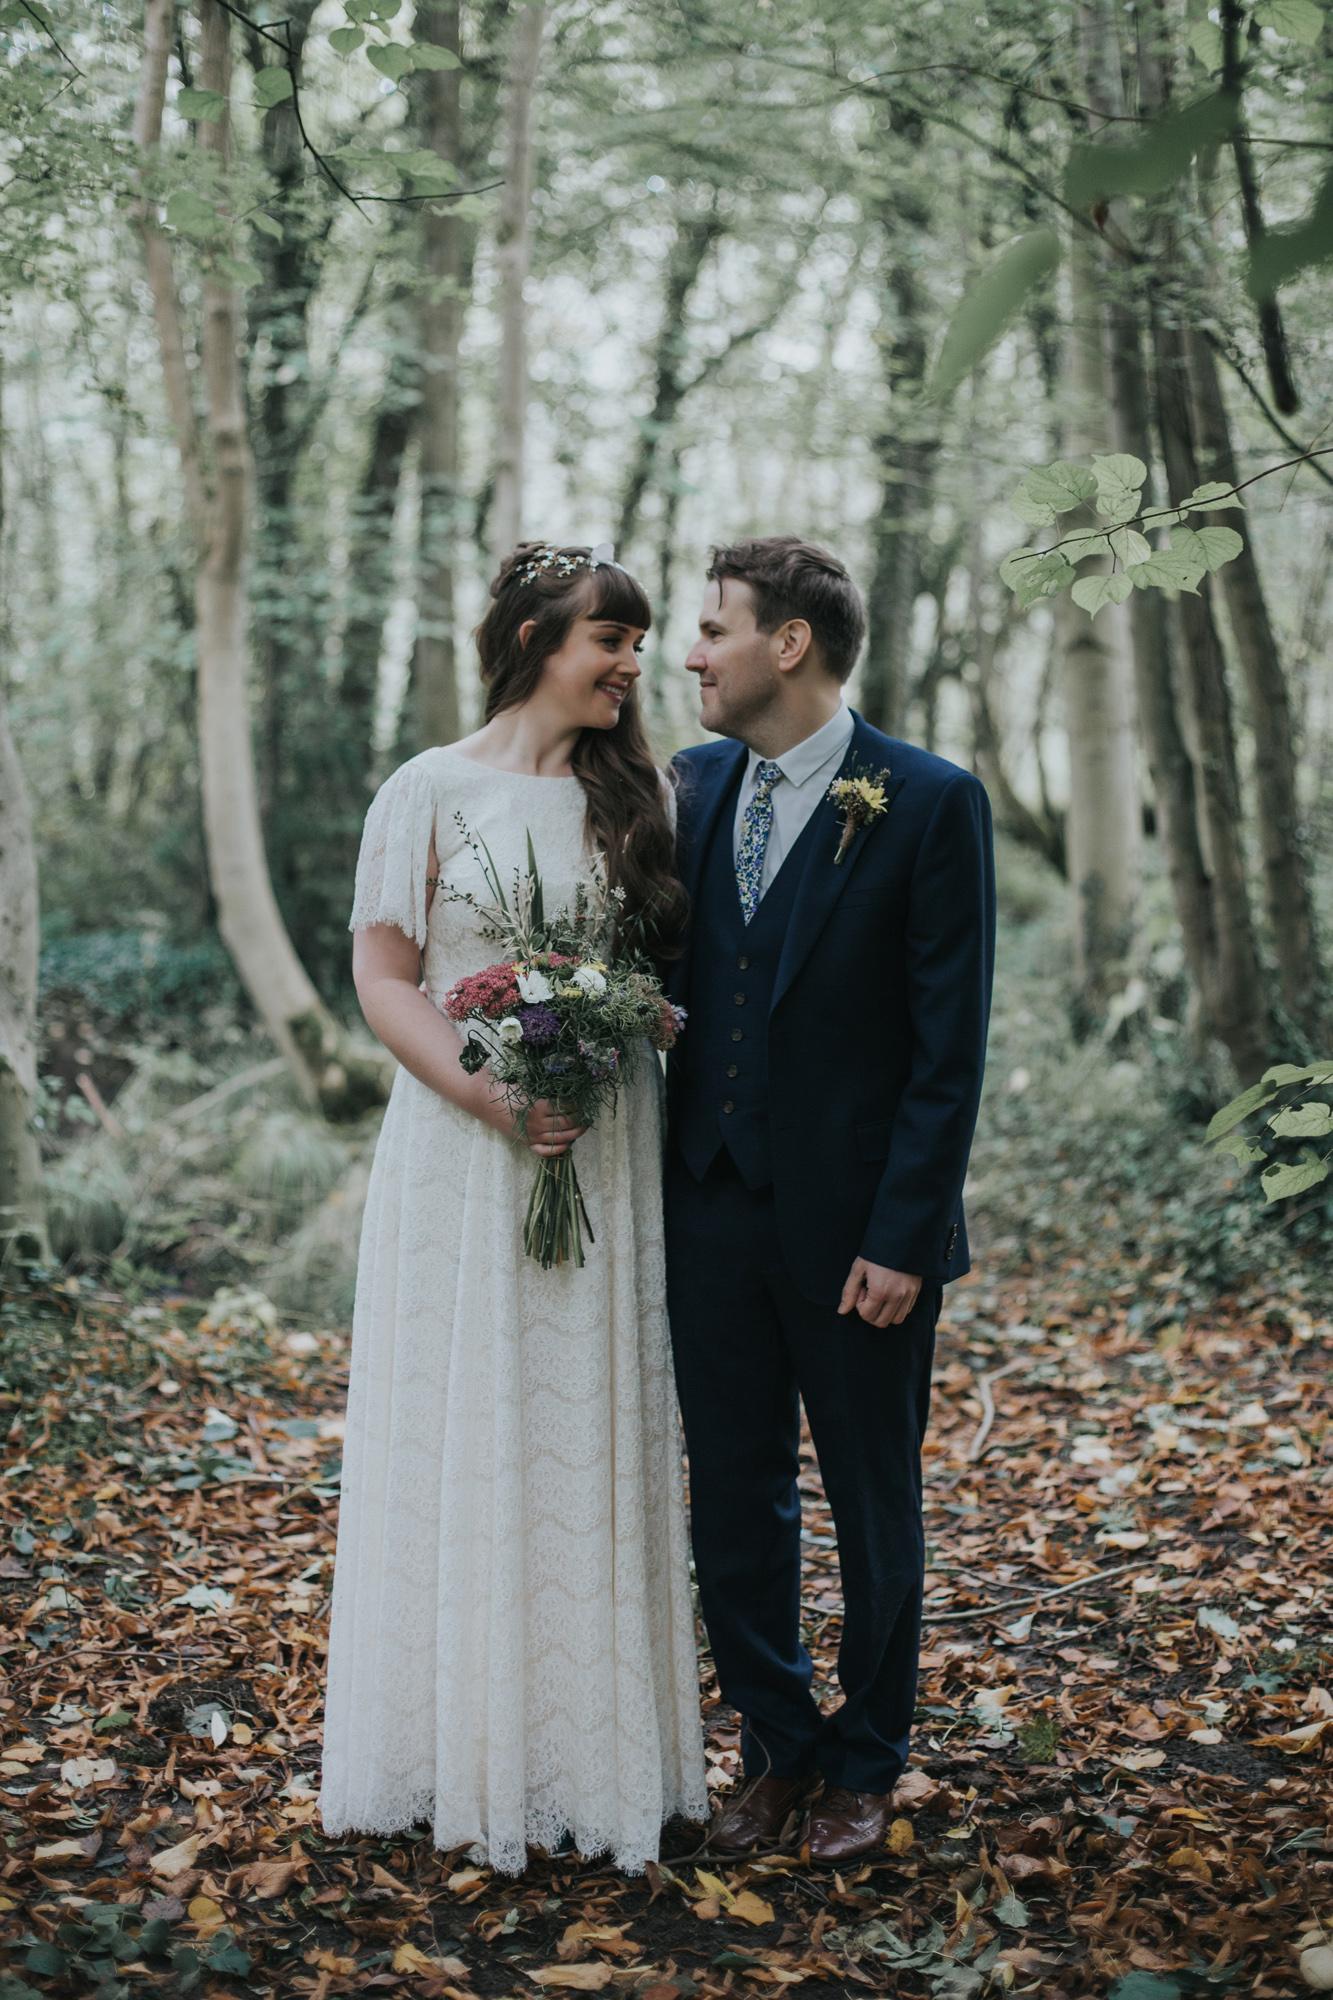 Kristy-Back-Garden-Outdoor-Wedding-Sheffield-Industrial-Warehouse-Wedding-Bohemian-Kate-Beaumont-Dahlia-Dress-24.jpg